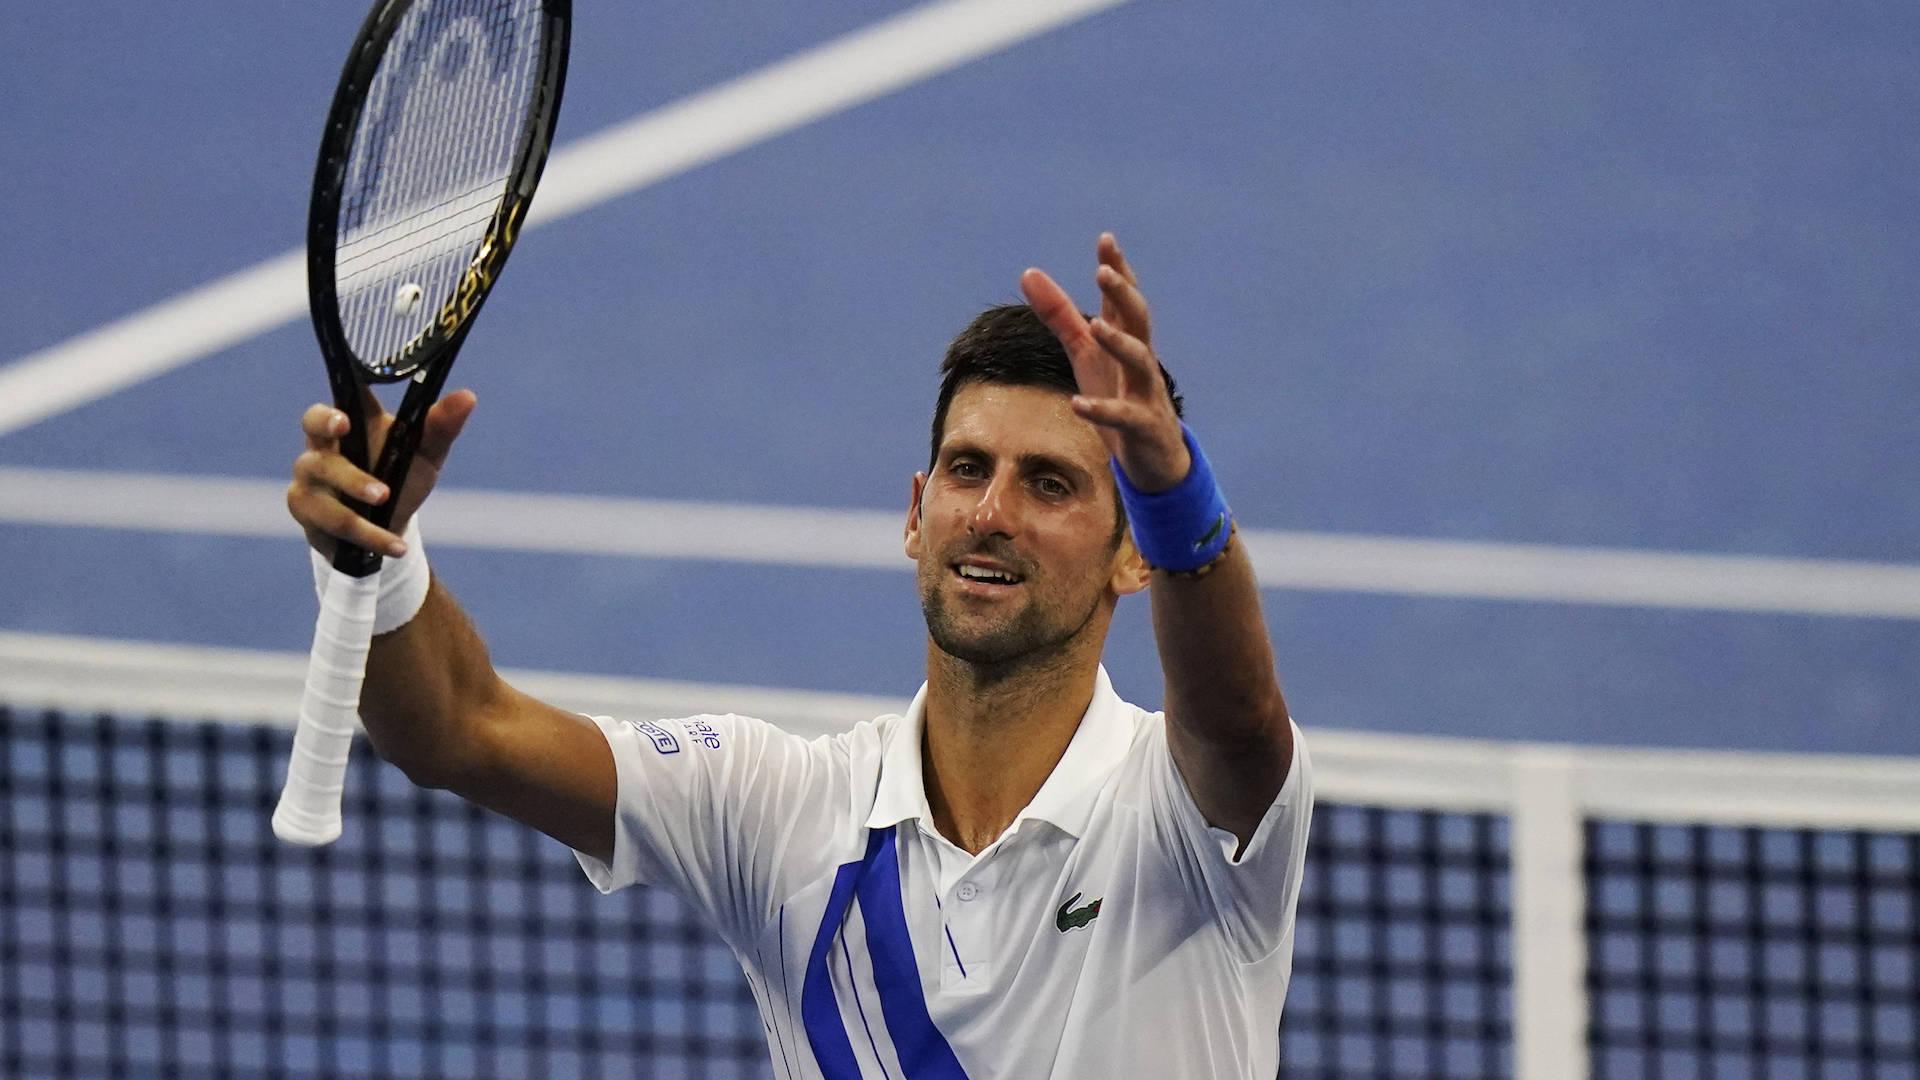 Novak Djokovic, winning a match at Southern and Western Open, August 2020